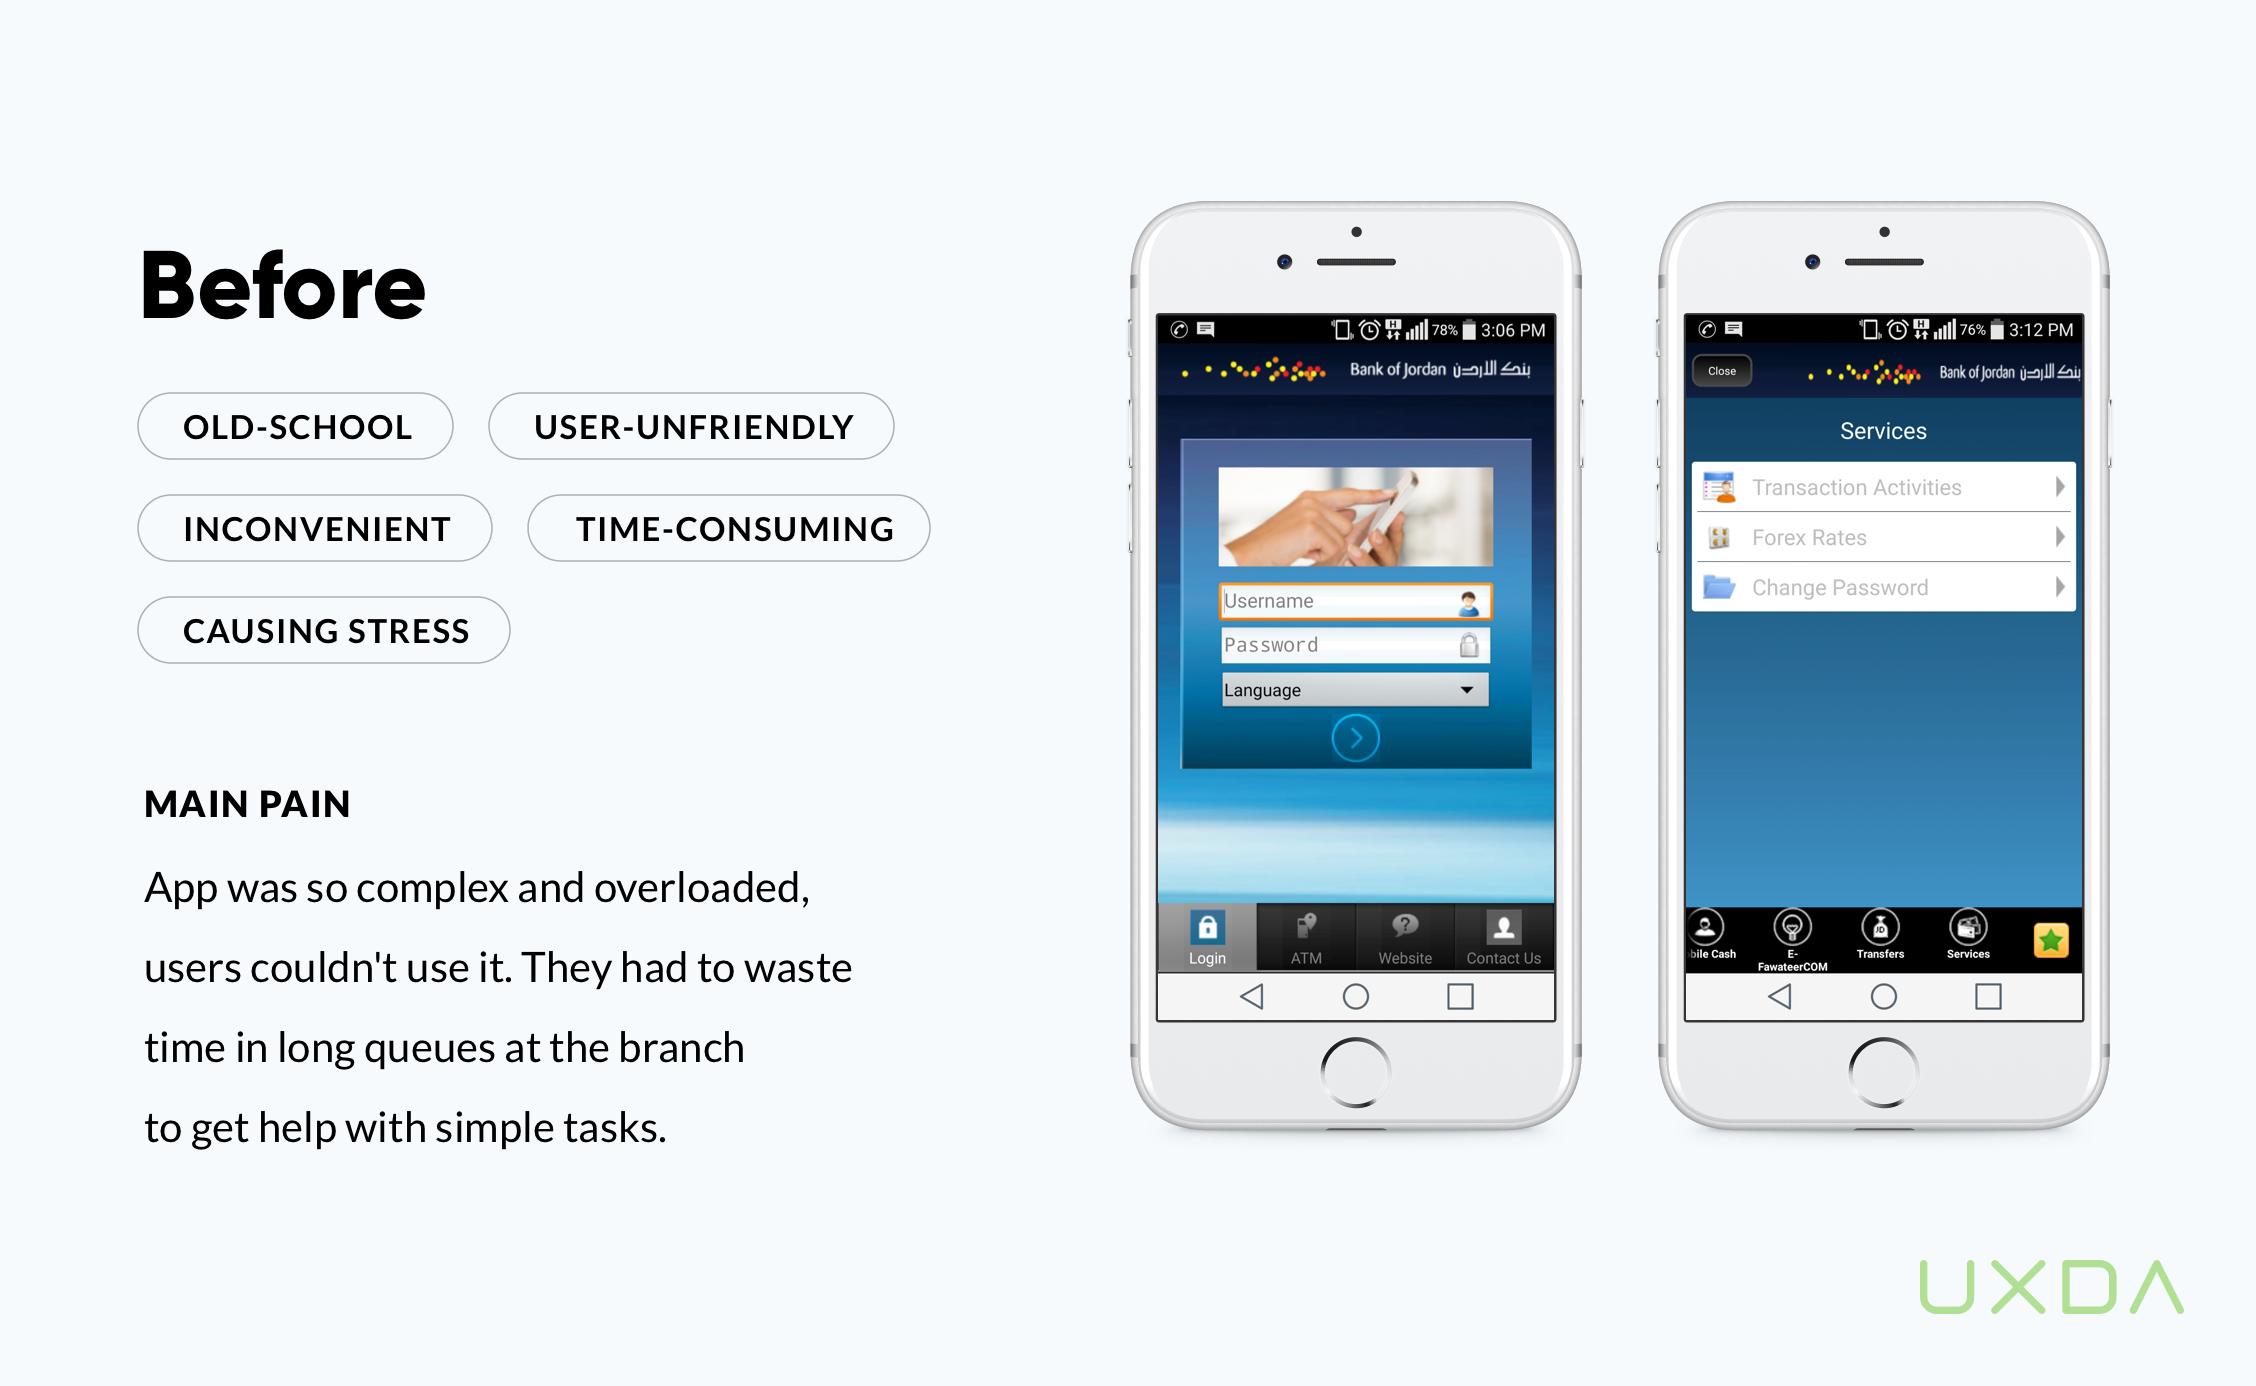 mobile-banking-ux-case-study-uxda-3.jpg